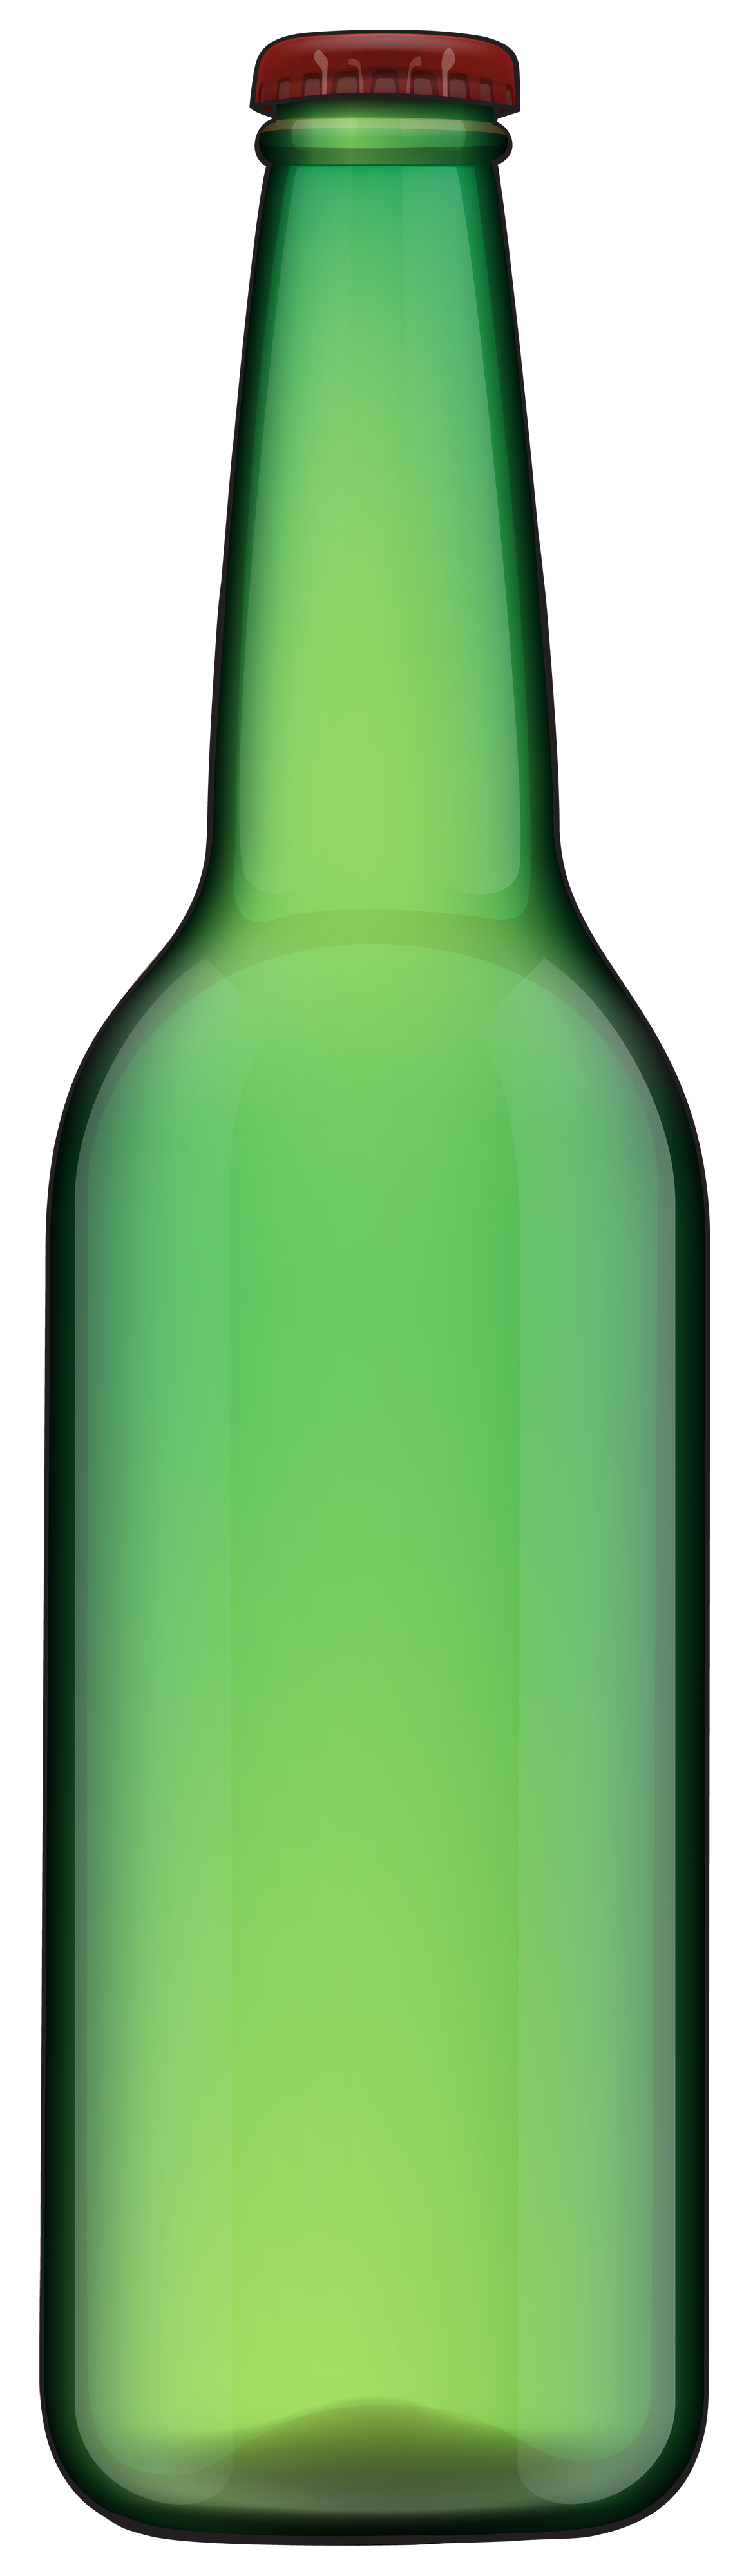 Beer line drawing at. Bottle clipart transparent background